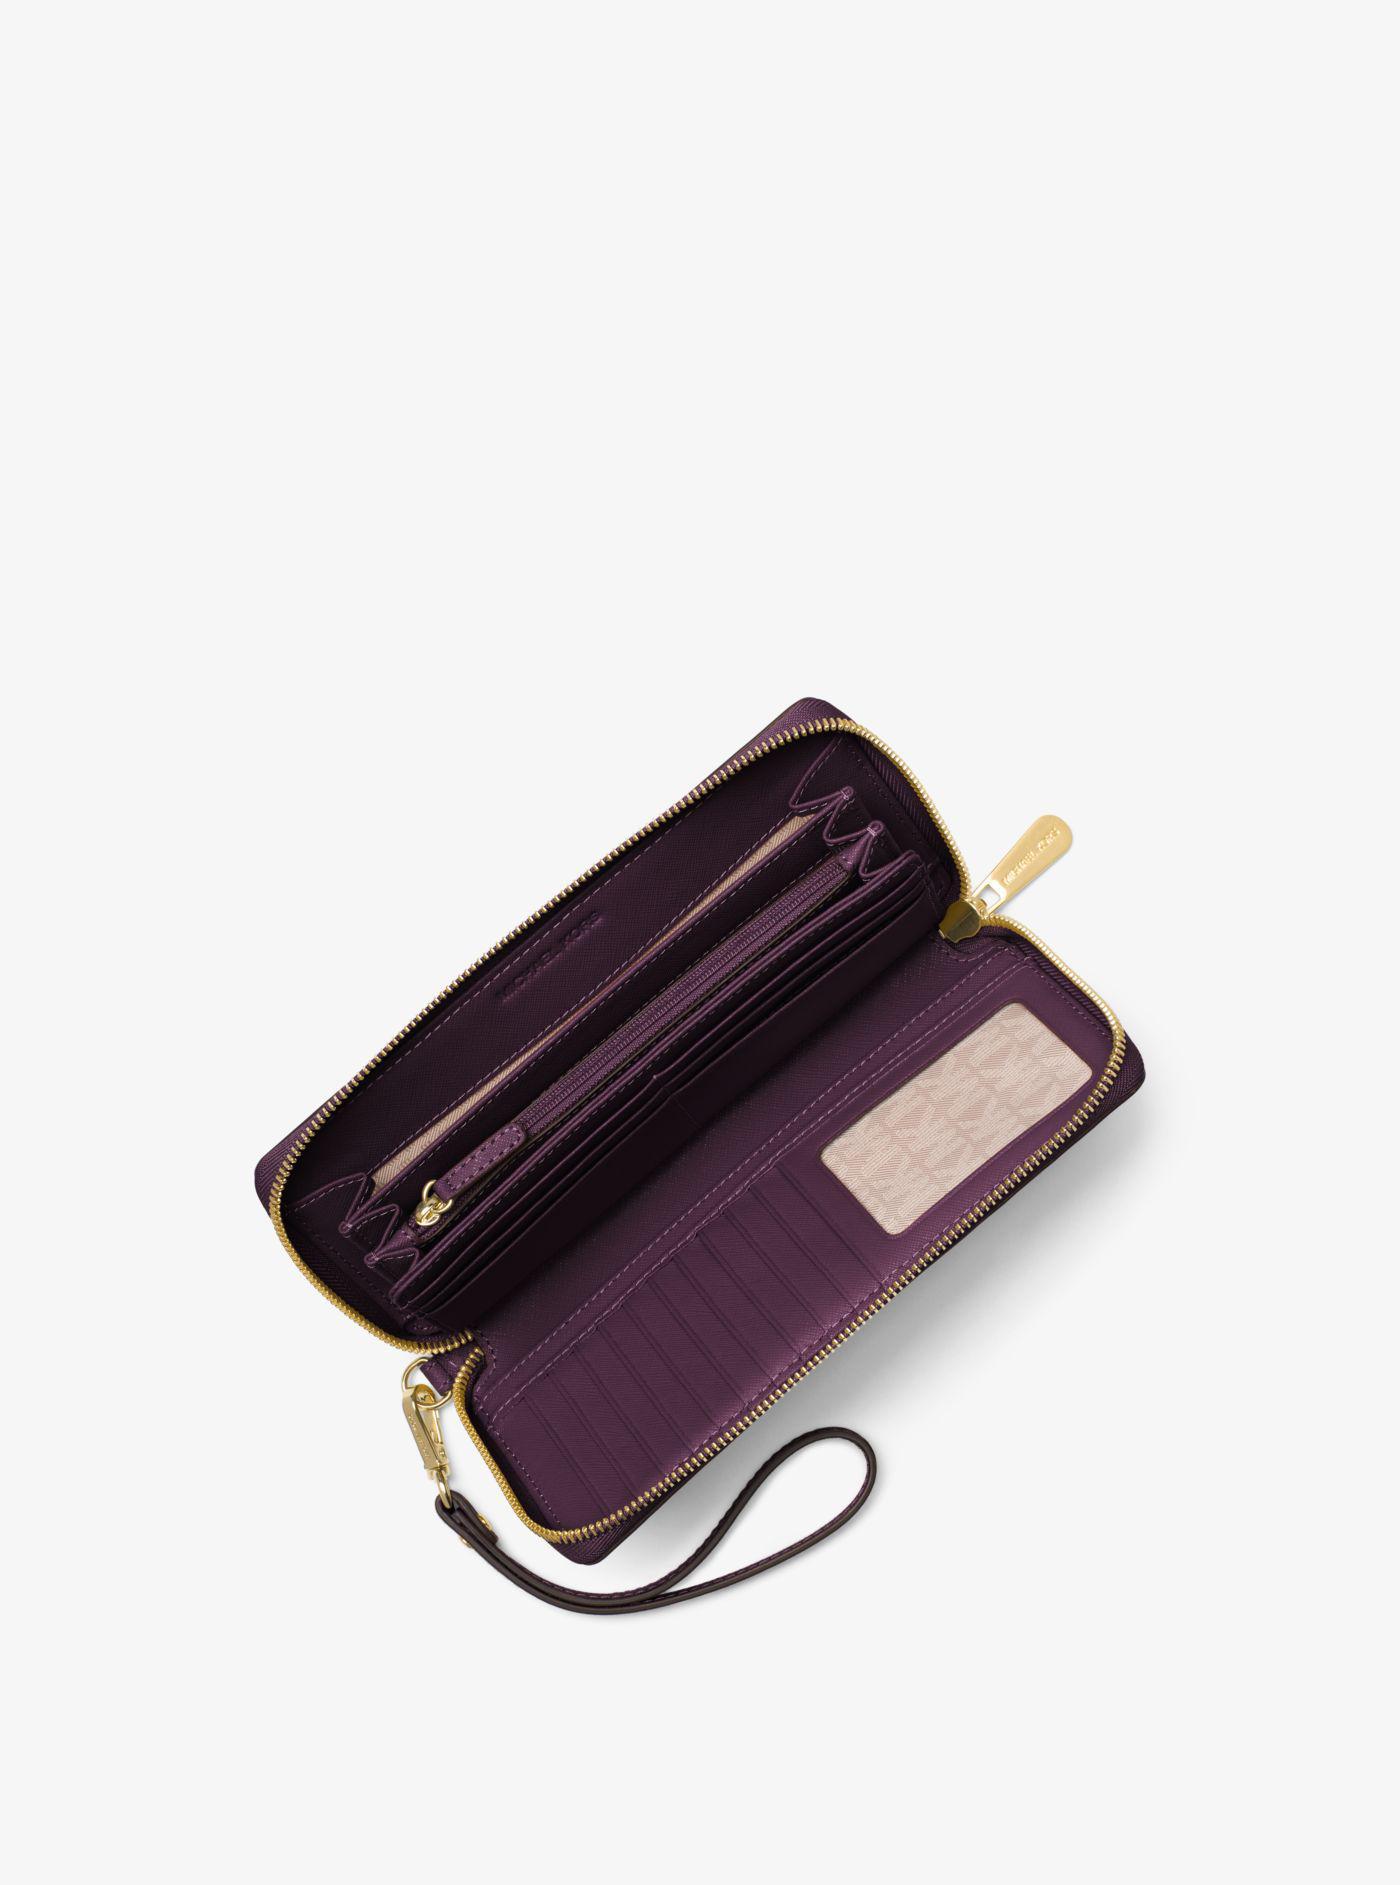 99927b81bd33 Lyst - Michael Kors Leather Continental Wristlet in Purple